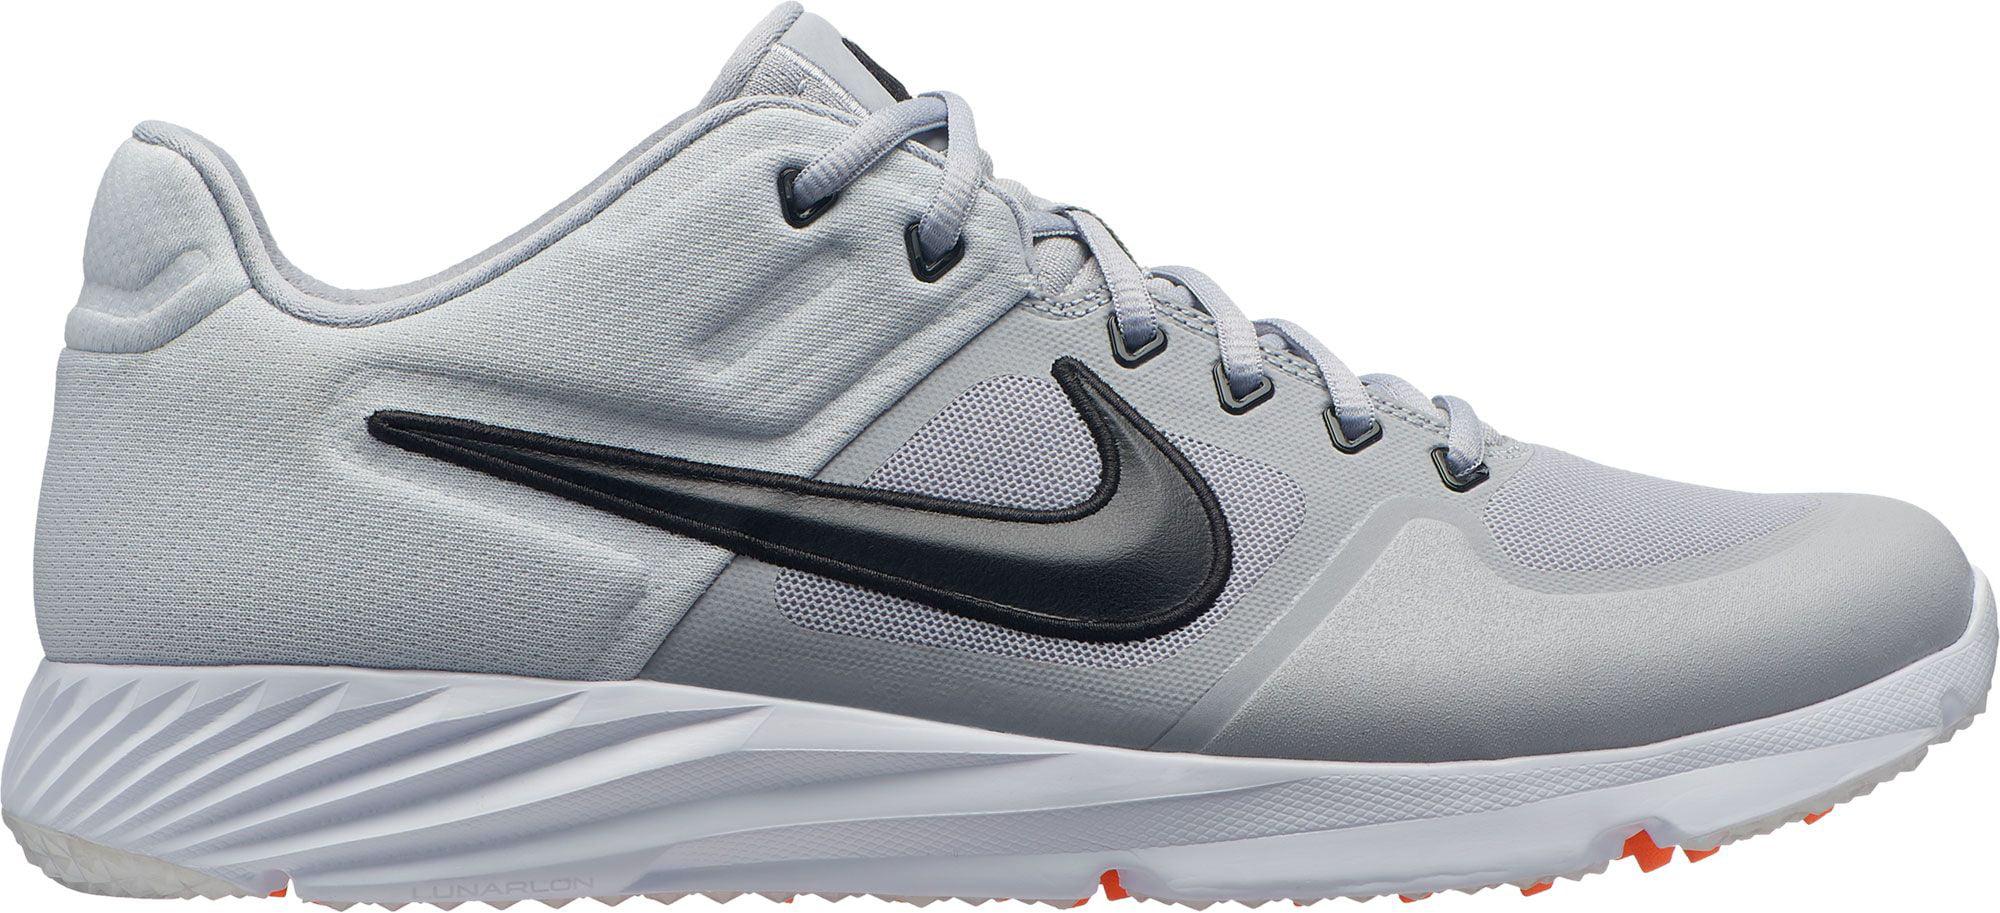 nike huarache baseball turf shoes